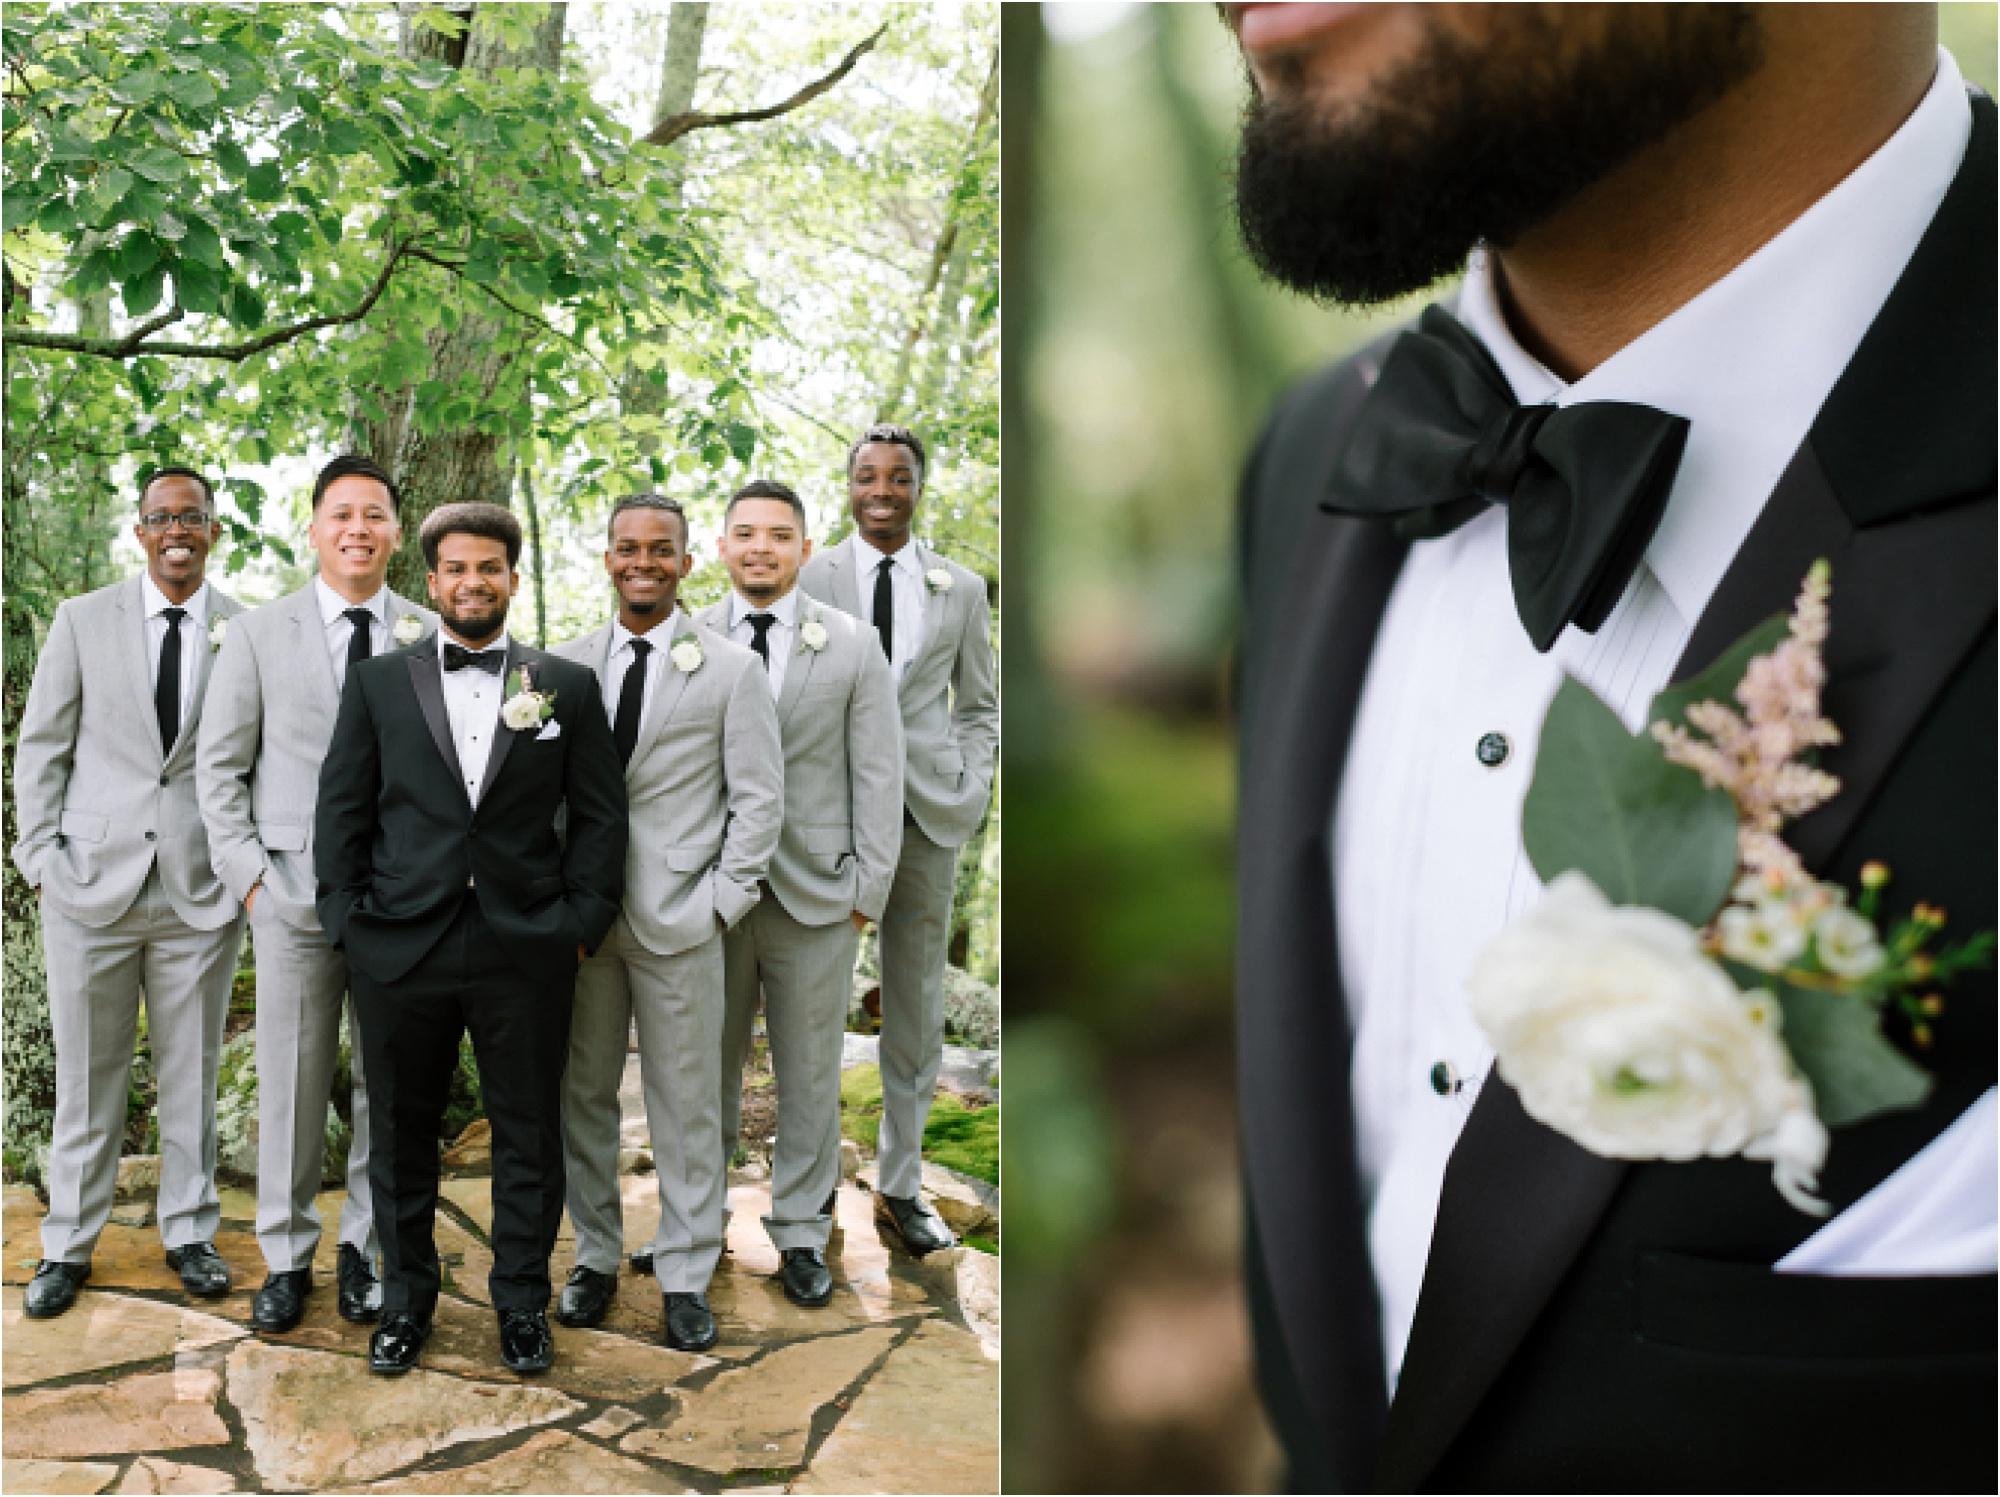 groom in black suit with groomsmen in gray suits